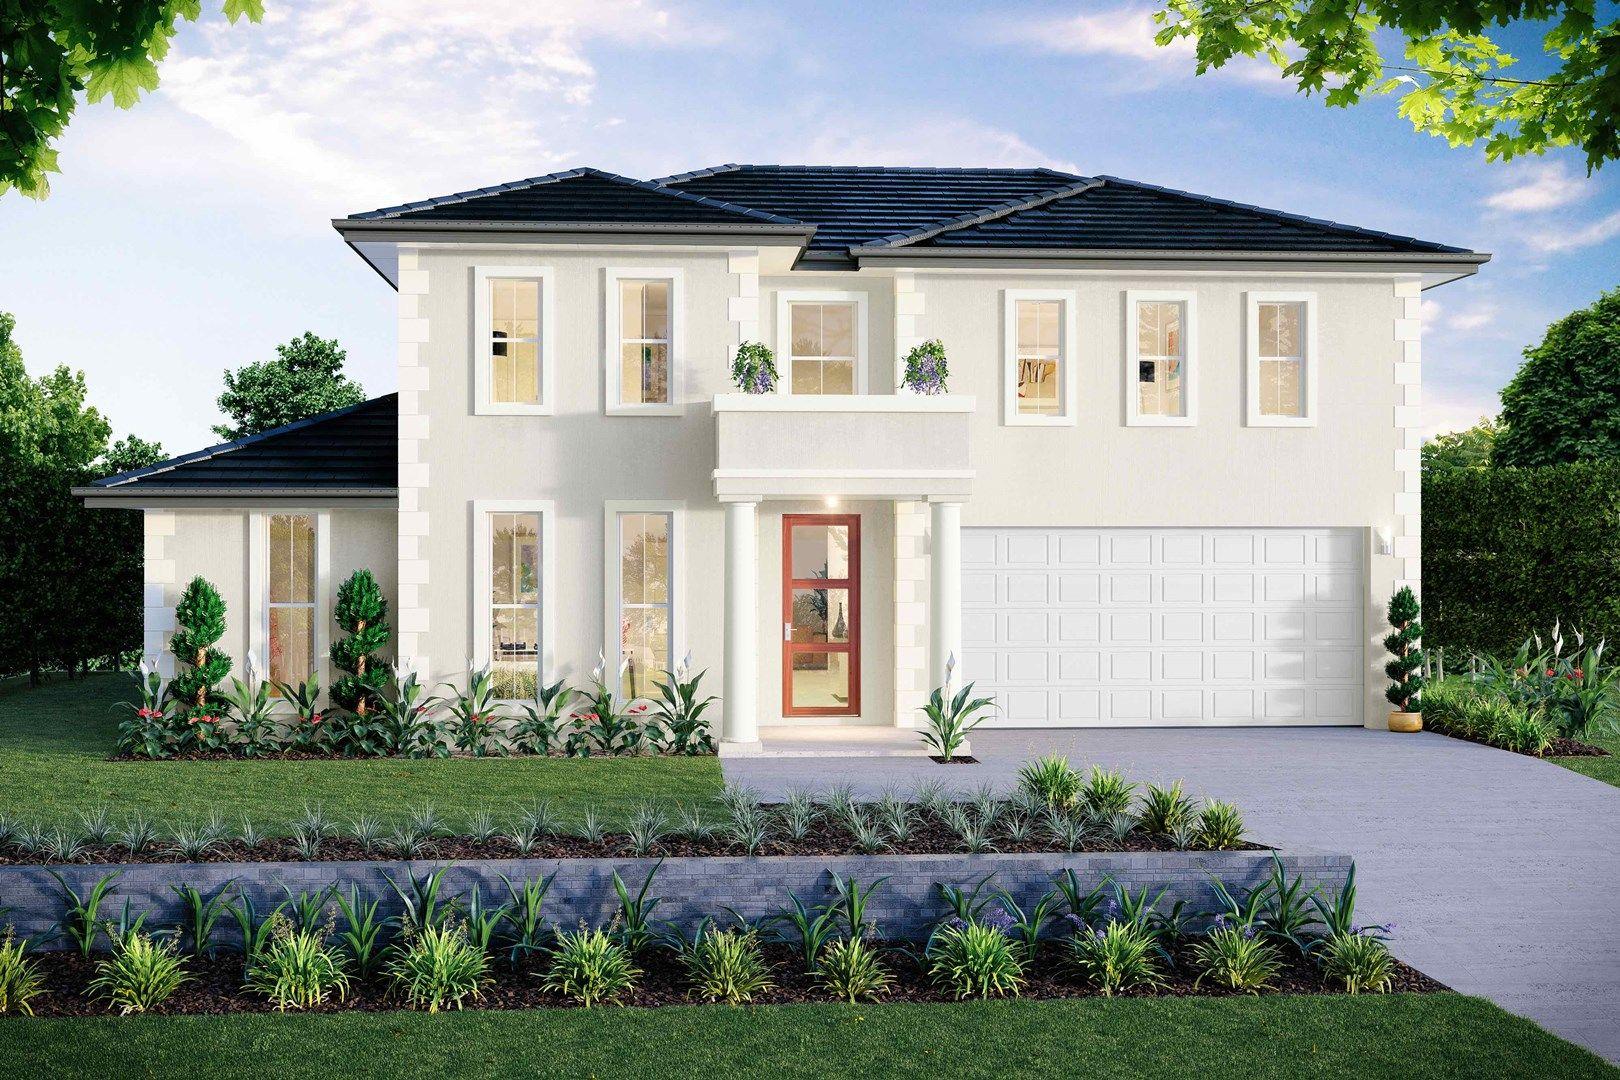 Lot 7 / 59 Miowera Road, Turramurra NSW 2074, Image 0